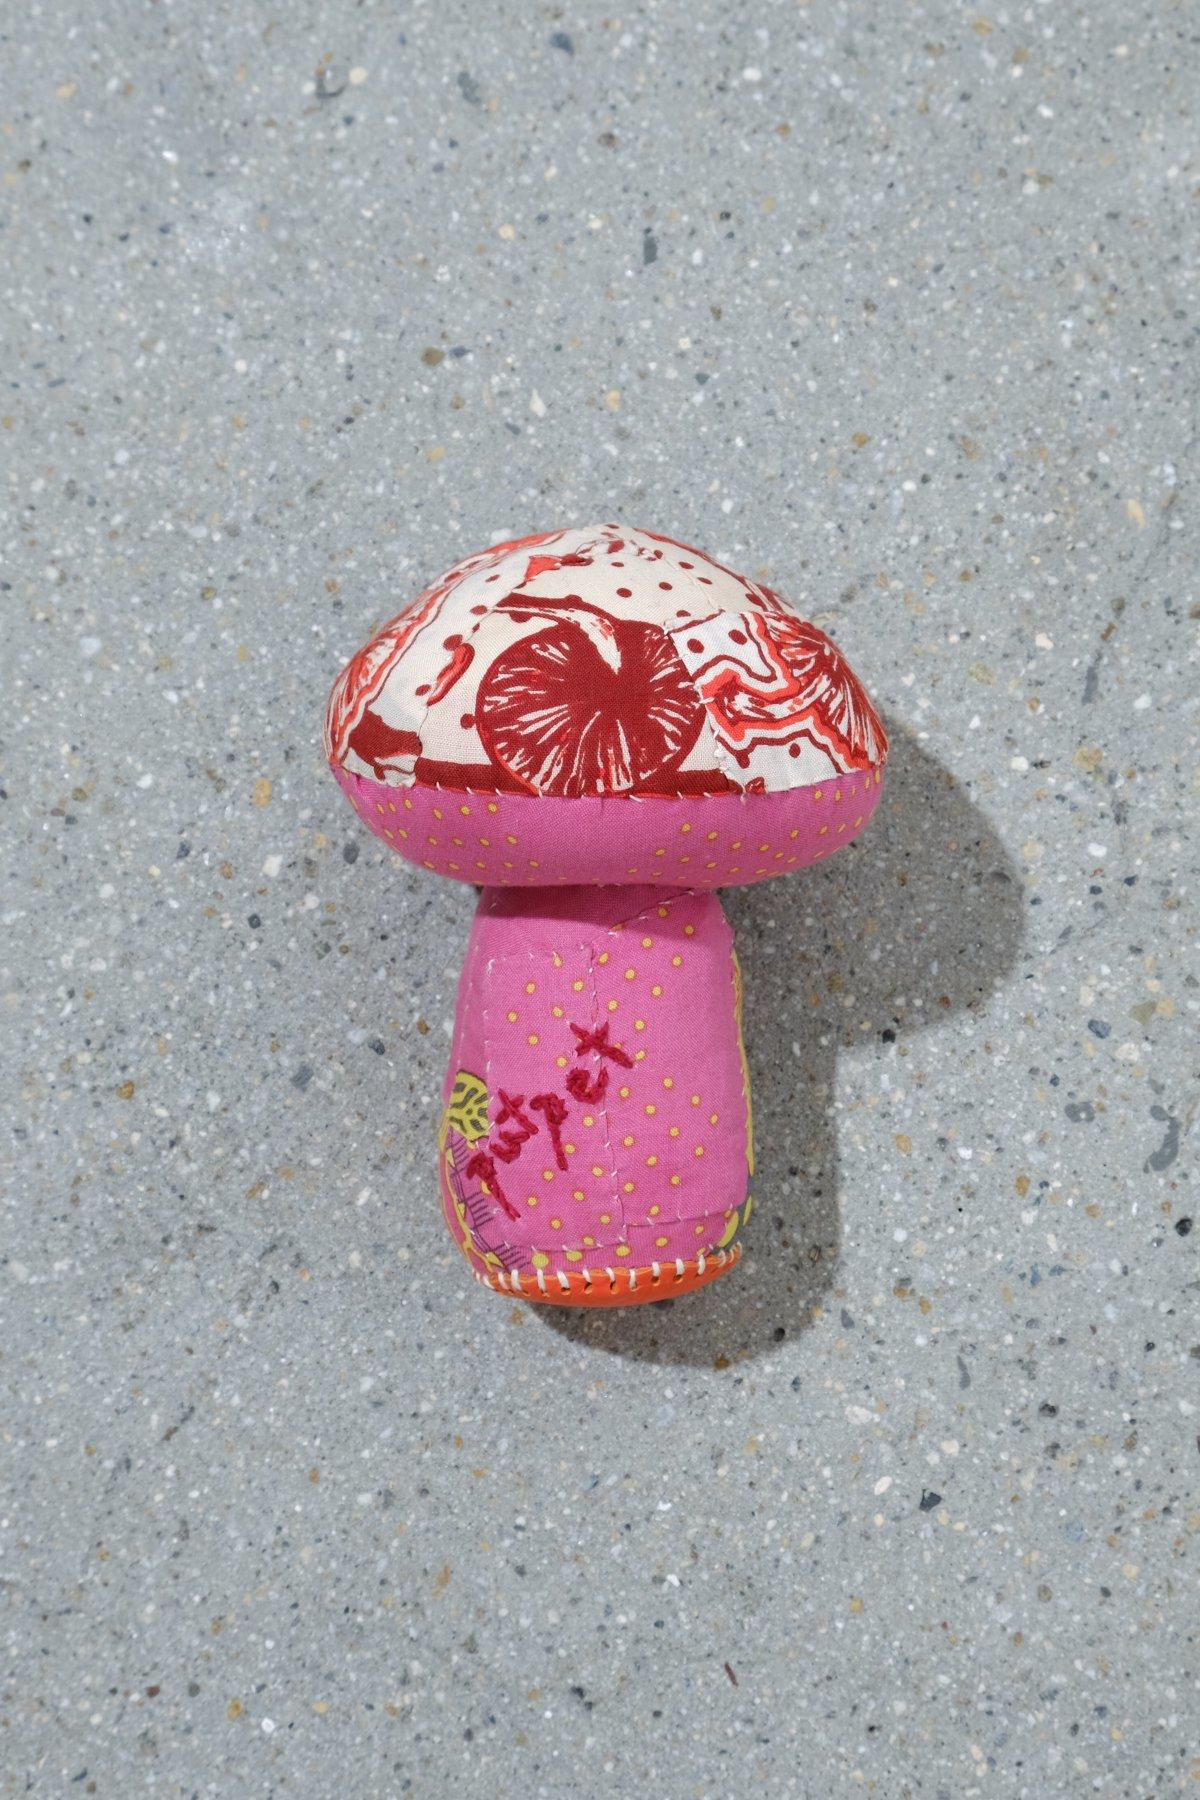 One Ear Brand / Putpet Bandanna Doll Mushroom 4